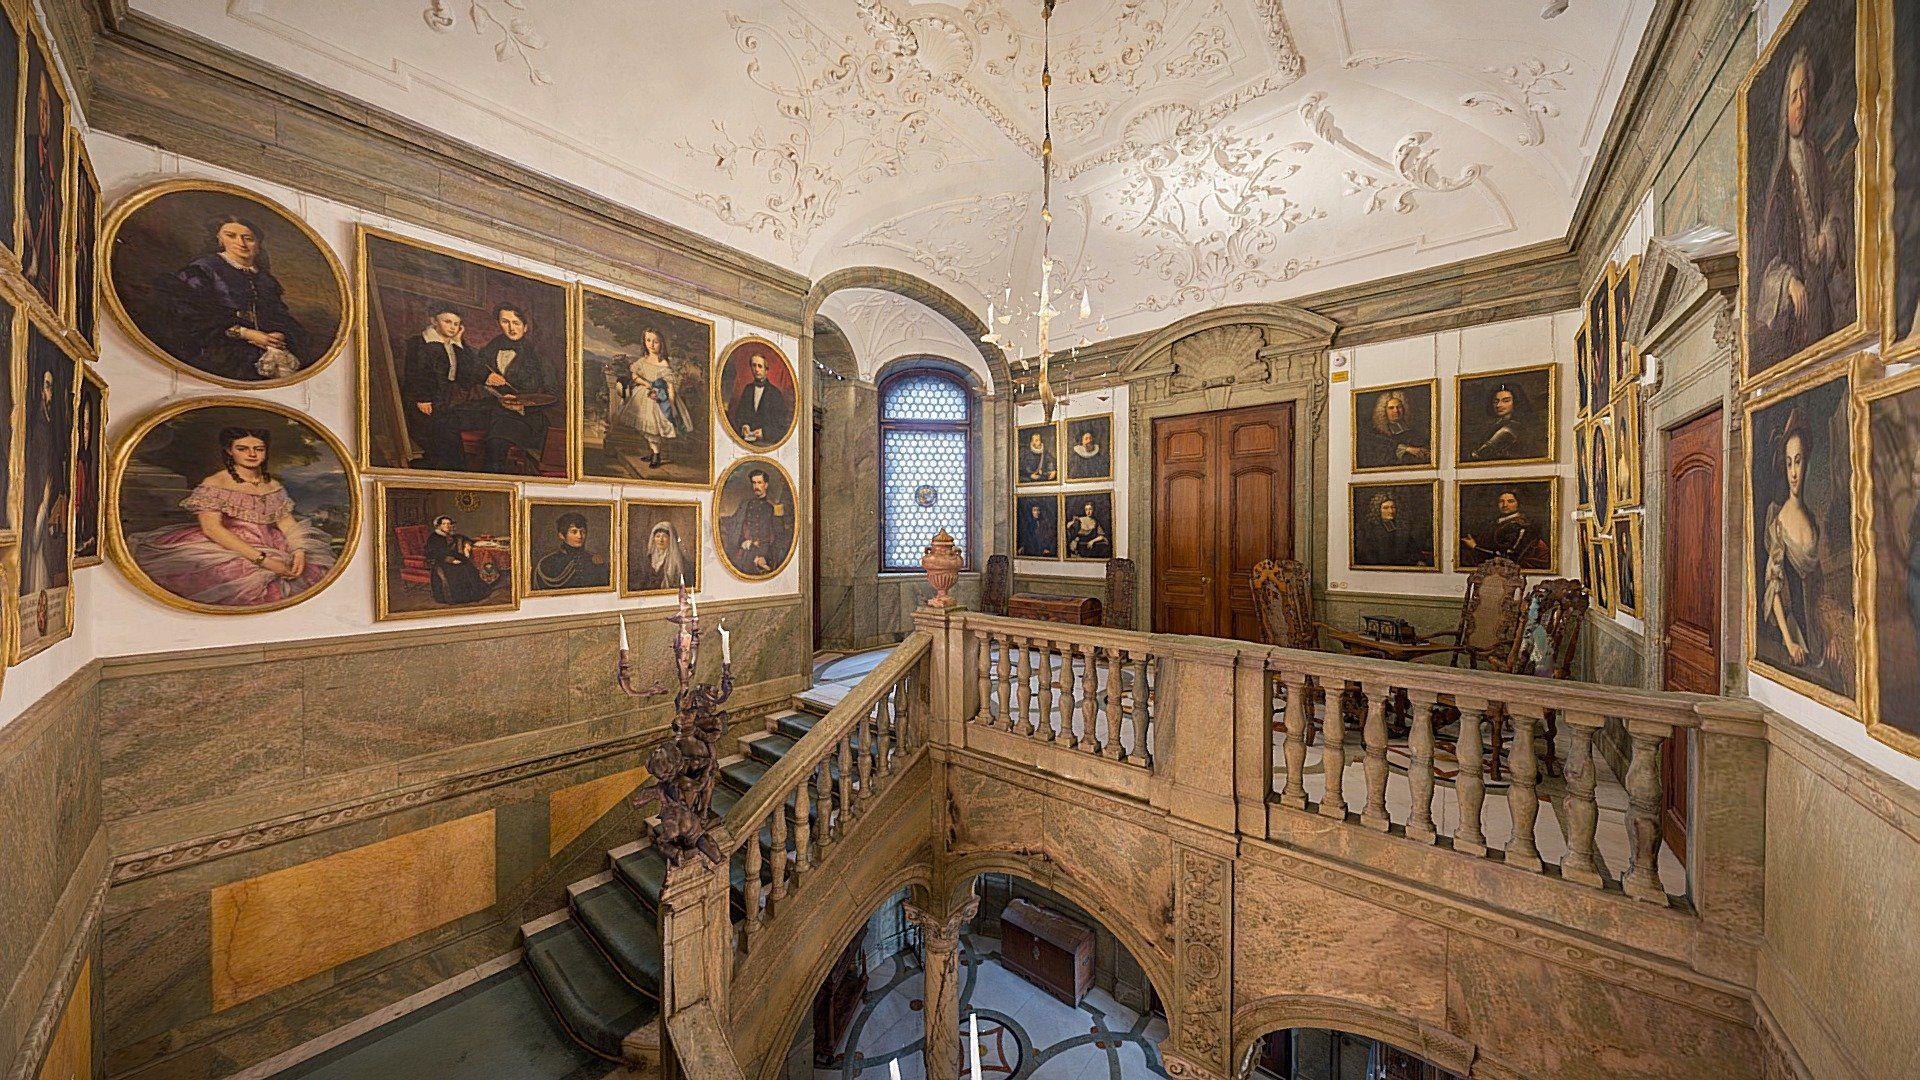 The Upper Vestibule by The Hallwyl Museum (Hallwylska museet